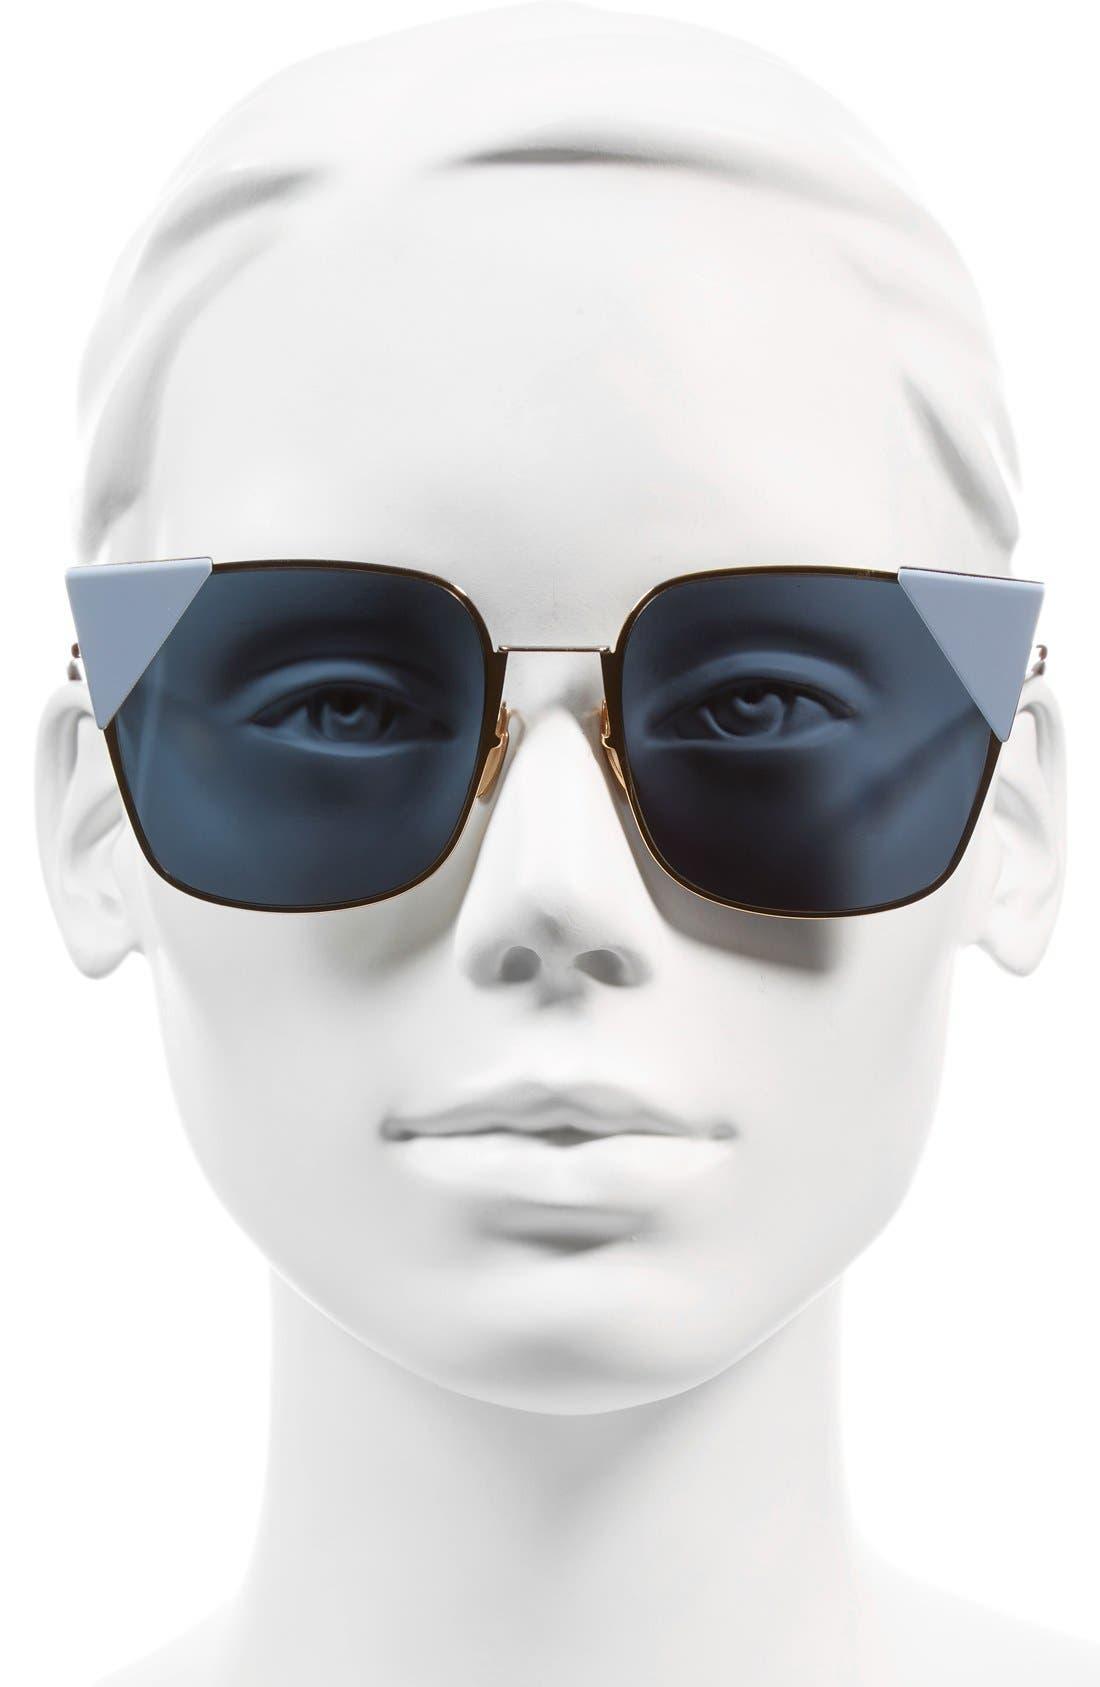 55mm Tipped Cat Eye Sunglasses,                             Alternate thumbnail 6, color,                             ROSE METALLIC GOLD